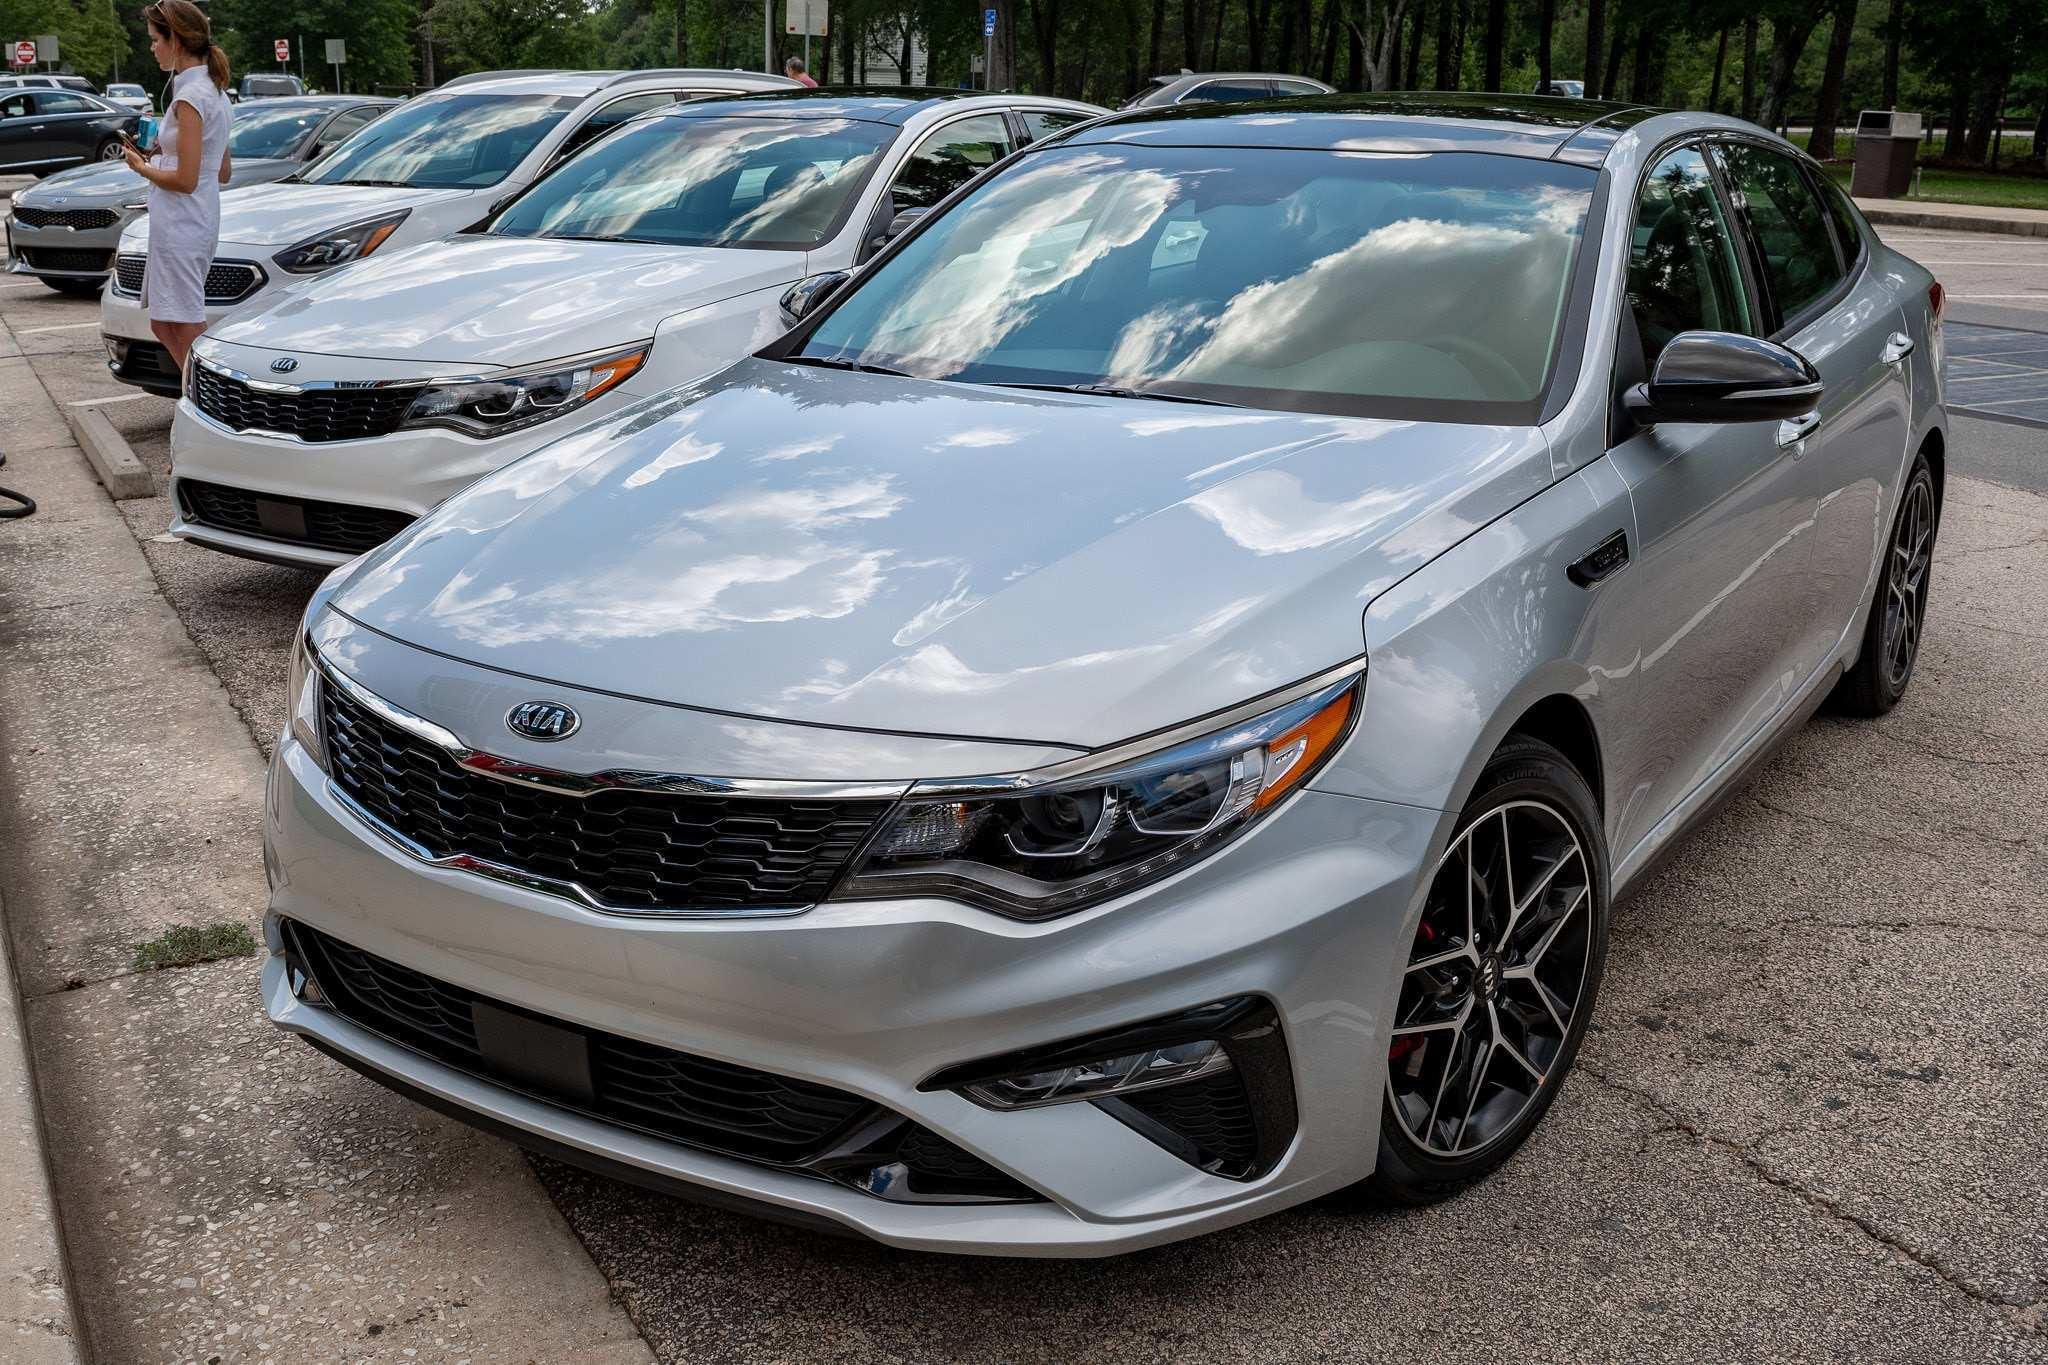 57 New 2019 Kia Optima Specs Redesign and Concept with 2019 Kia Optima Specs